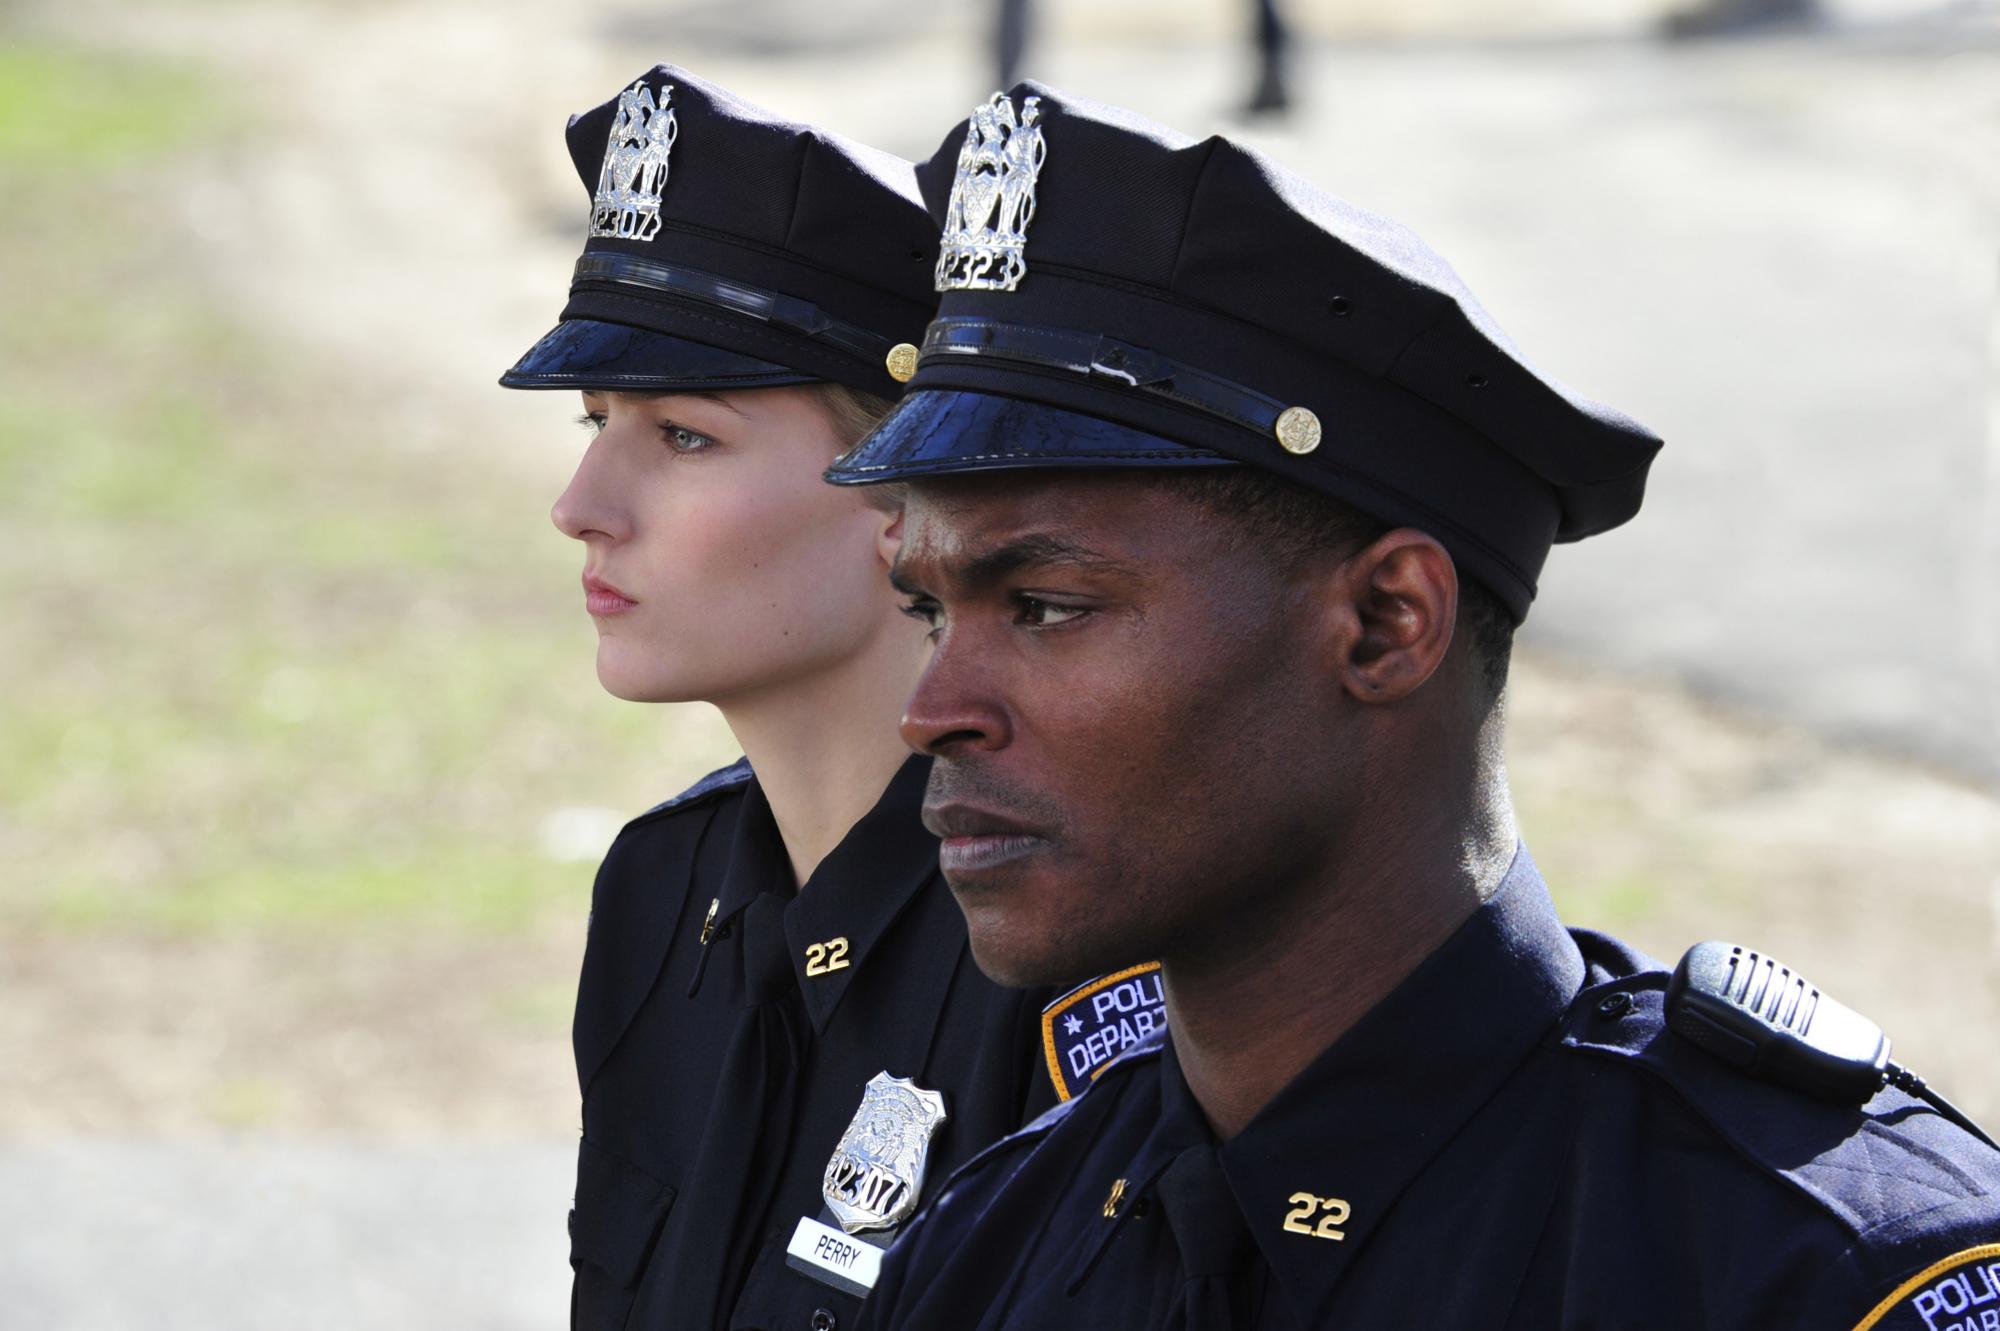 Leelee Sobieski and Harold House Moore in NYC 22 (2012)